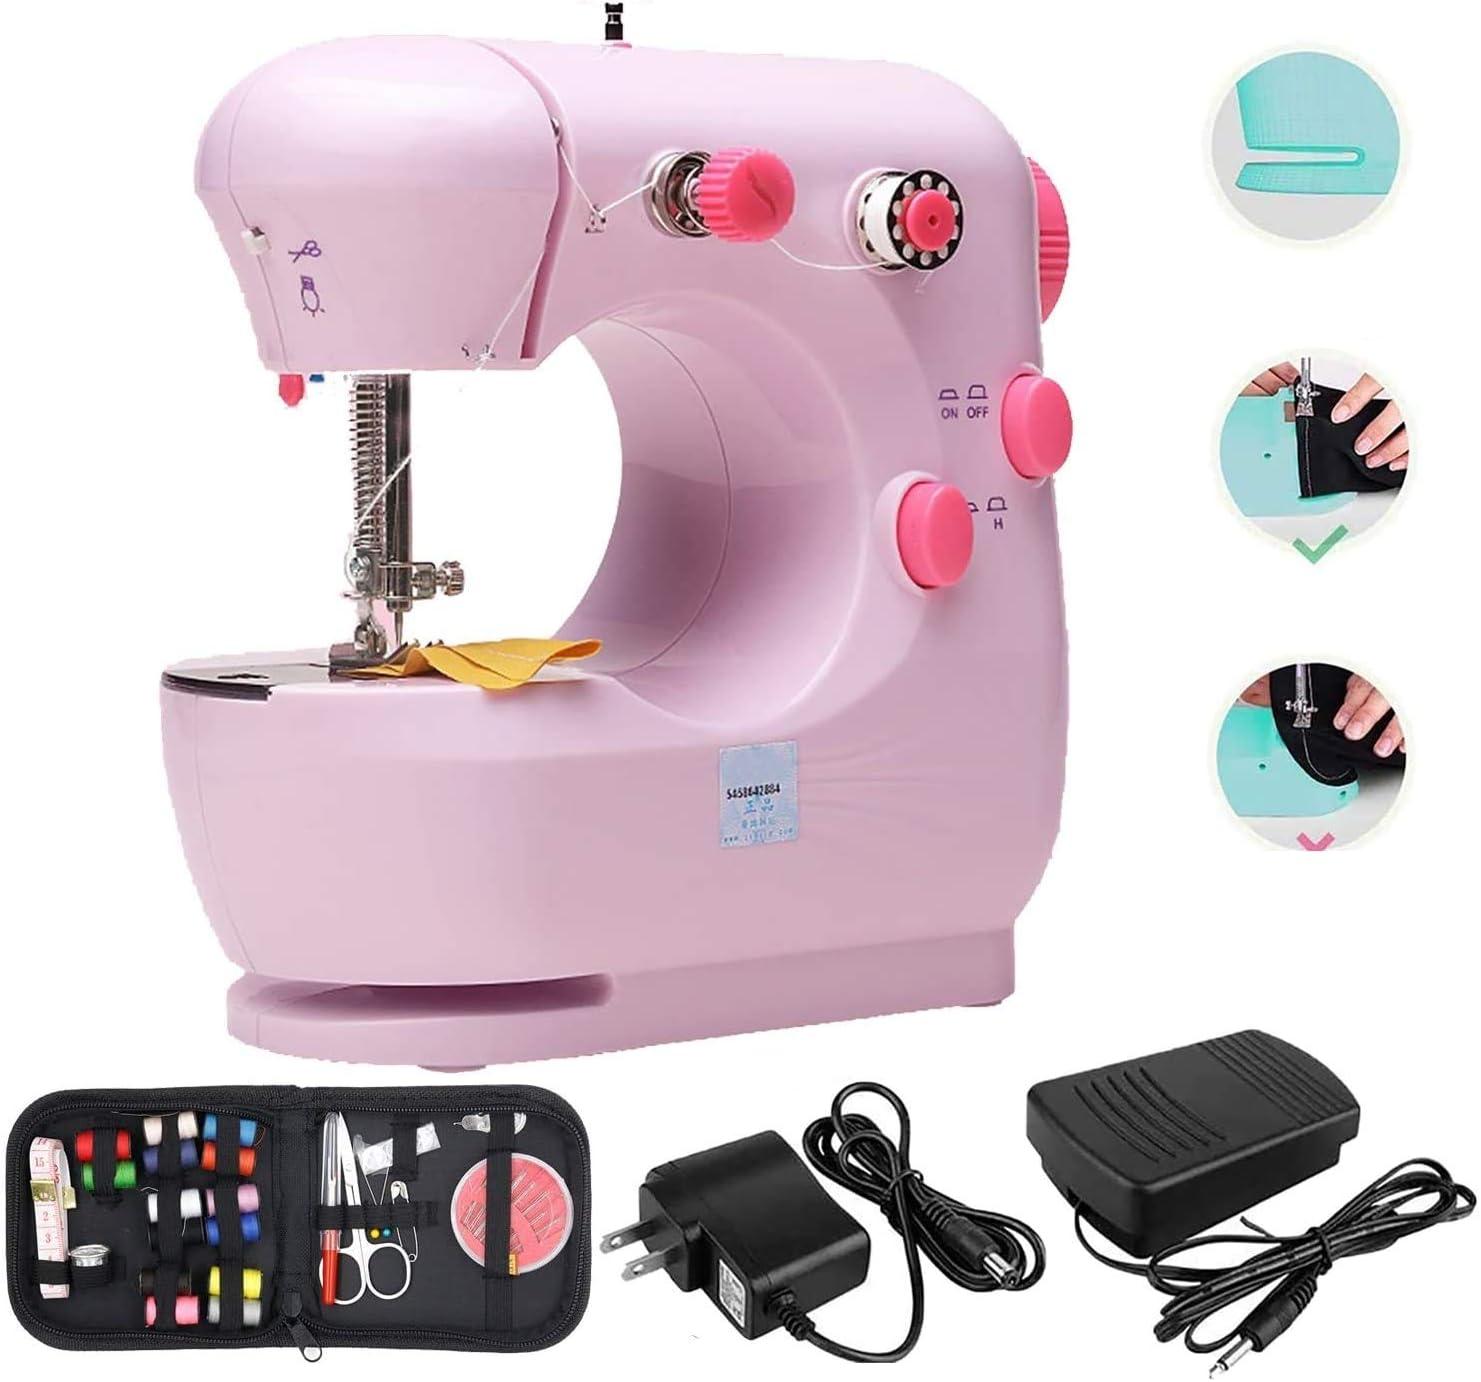 TooFu Manufacturer regenerated product Beginner Locking Popular Machine Sewing Household El Mini